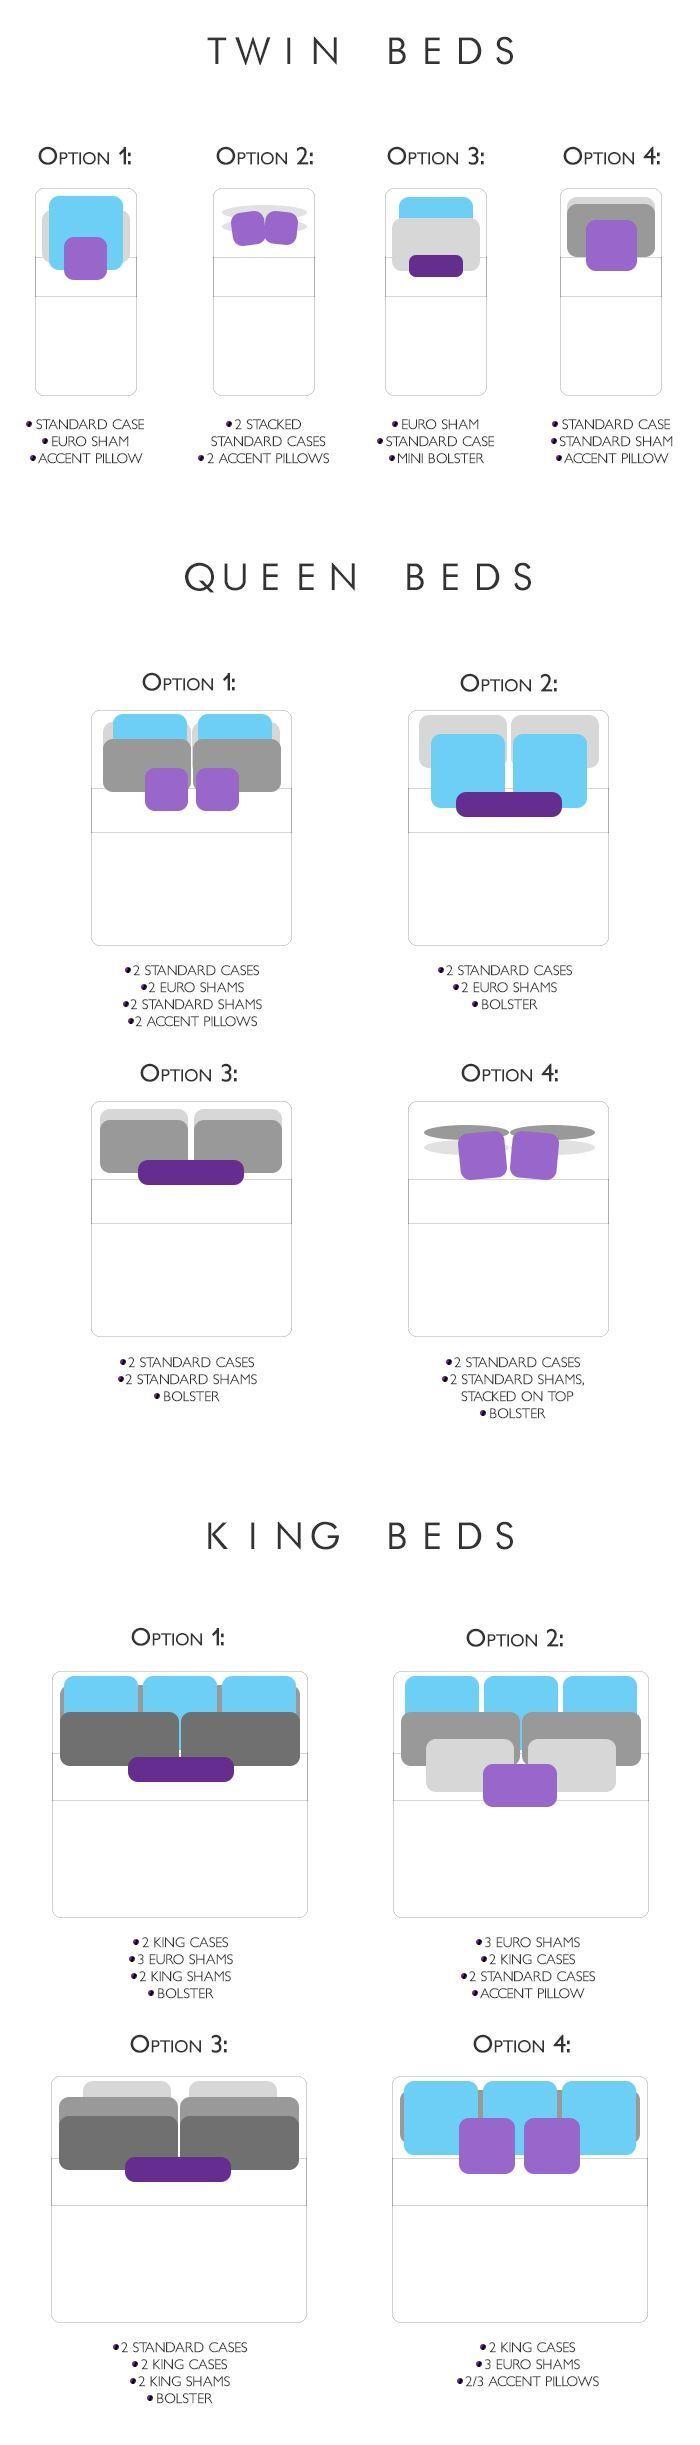 Twin loft bed craigslist   best images about Beds on Pinterest  Home projects Loft beds